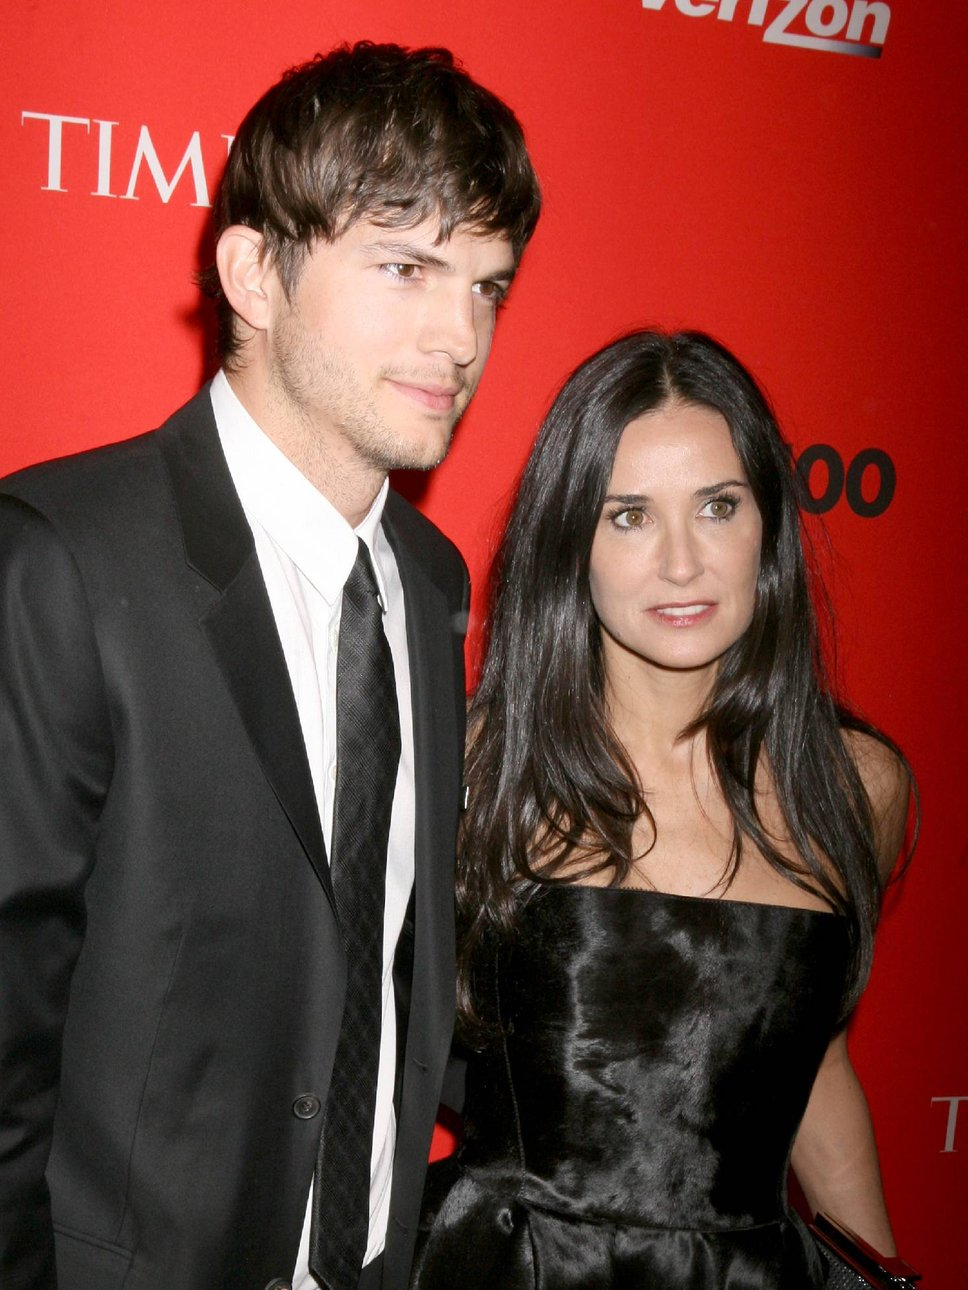 Ashton Kutcher : The Evening Suit